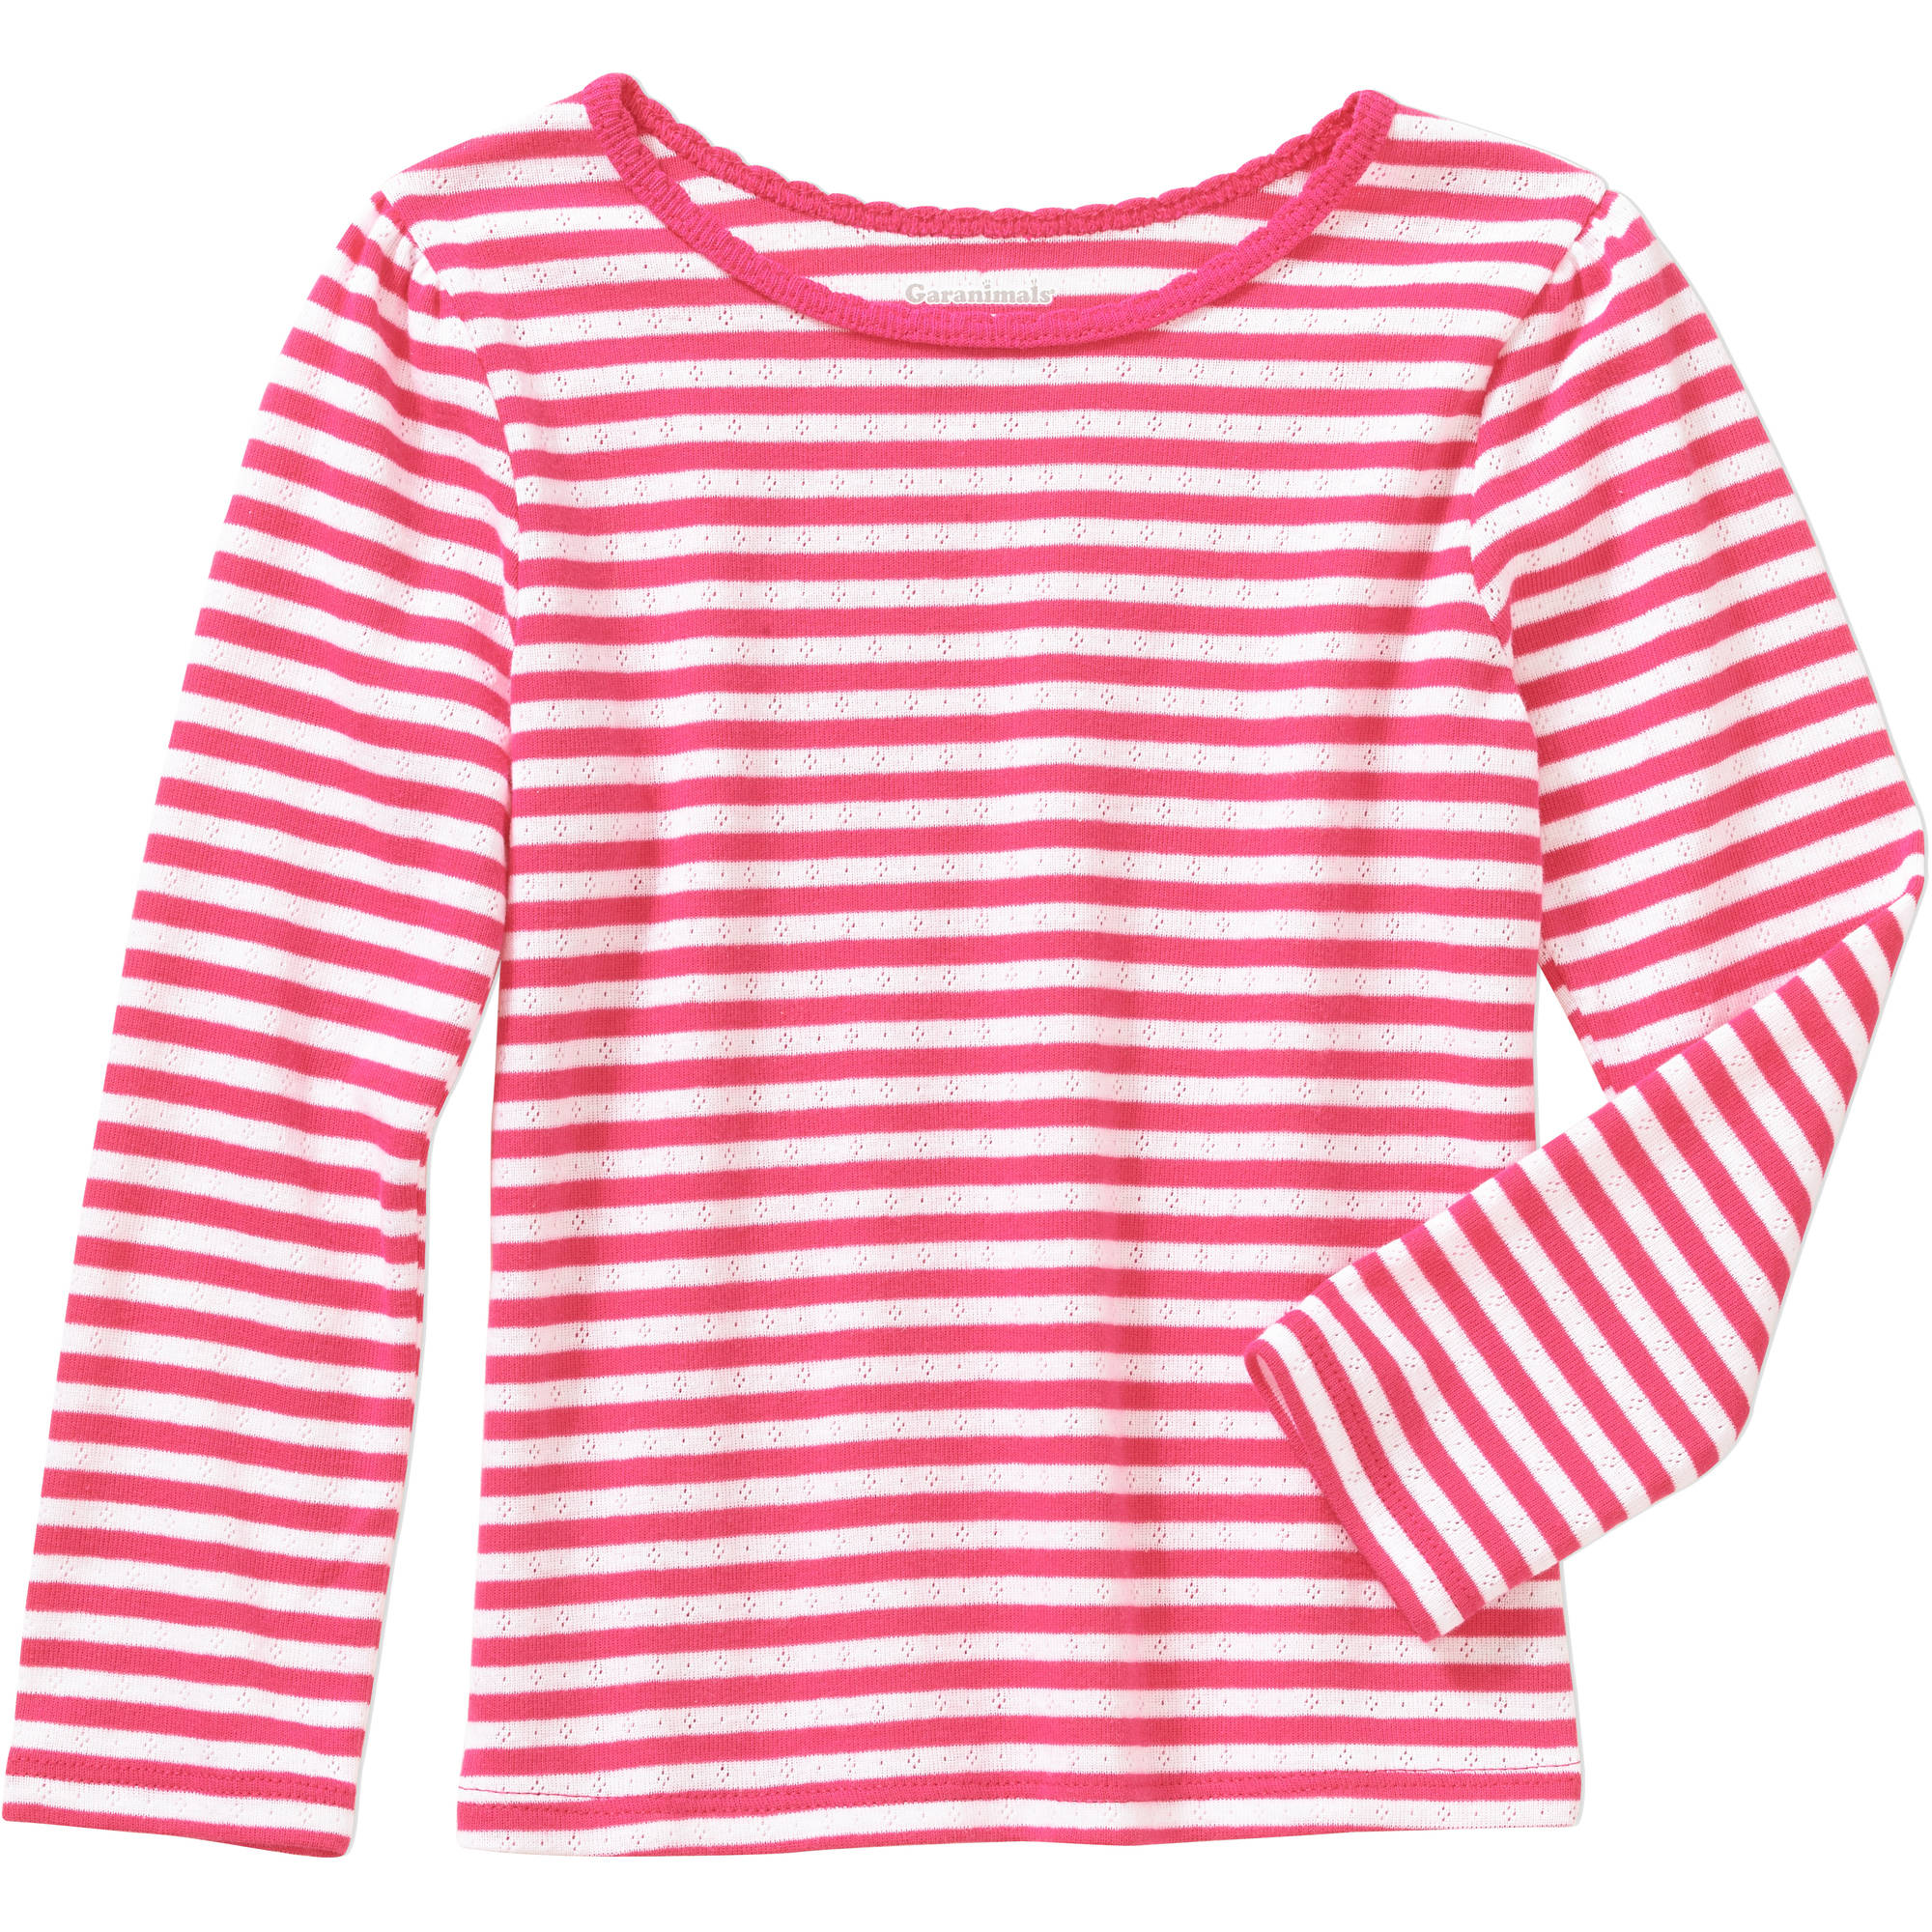 Garanimals Baby Toddler Girl Long Sleeve Pointelle Stripe Tee